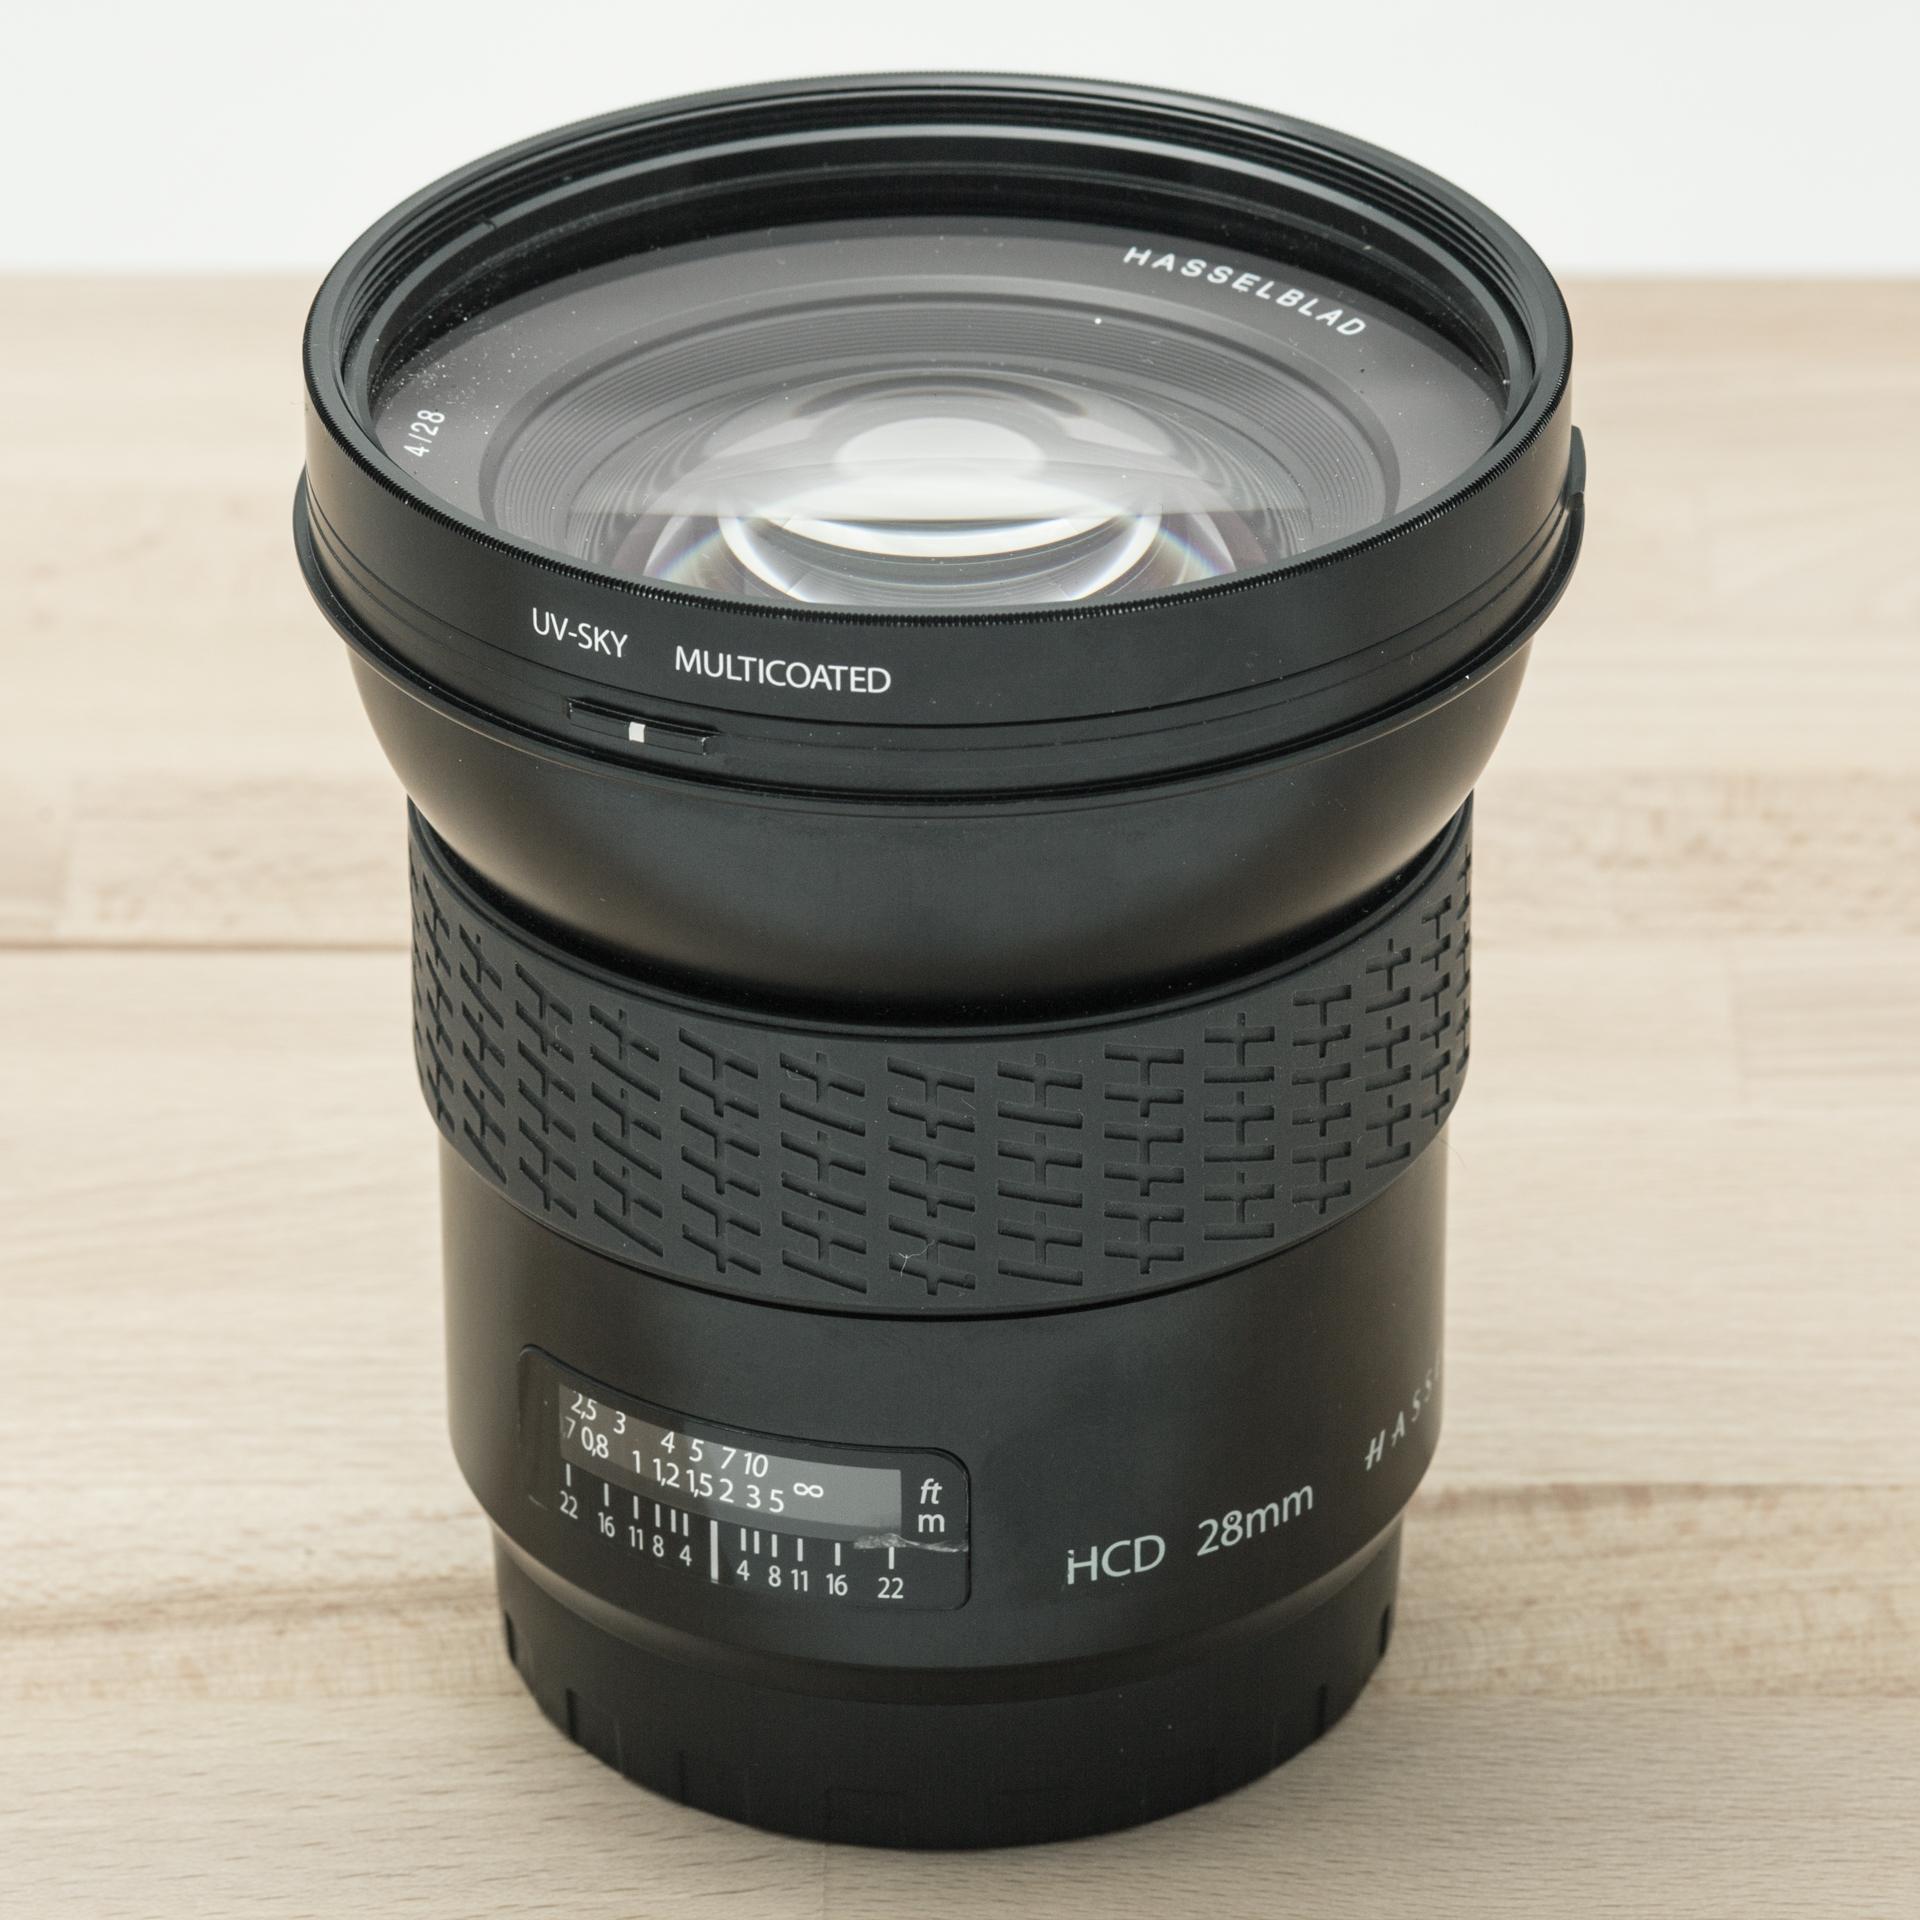 Hasselblad HCD 28mm f/4 + Lens Shade + UV-Sky 95mm // 7.809 exposures